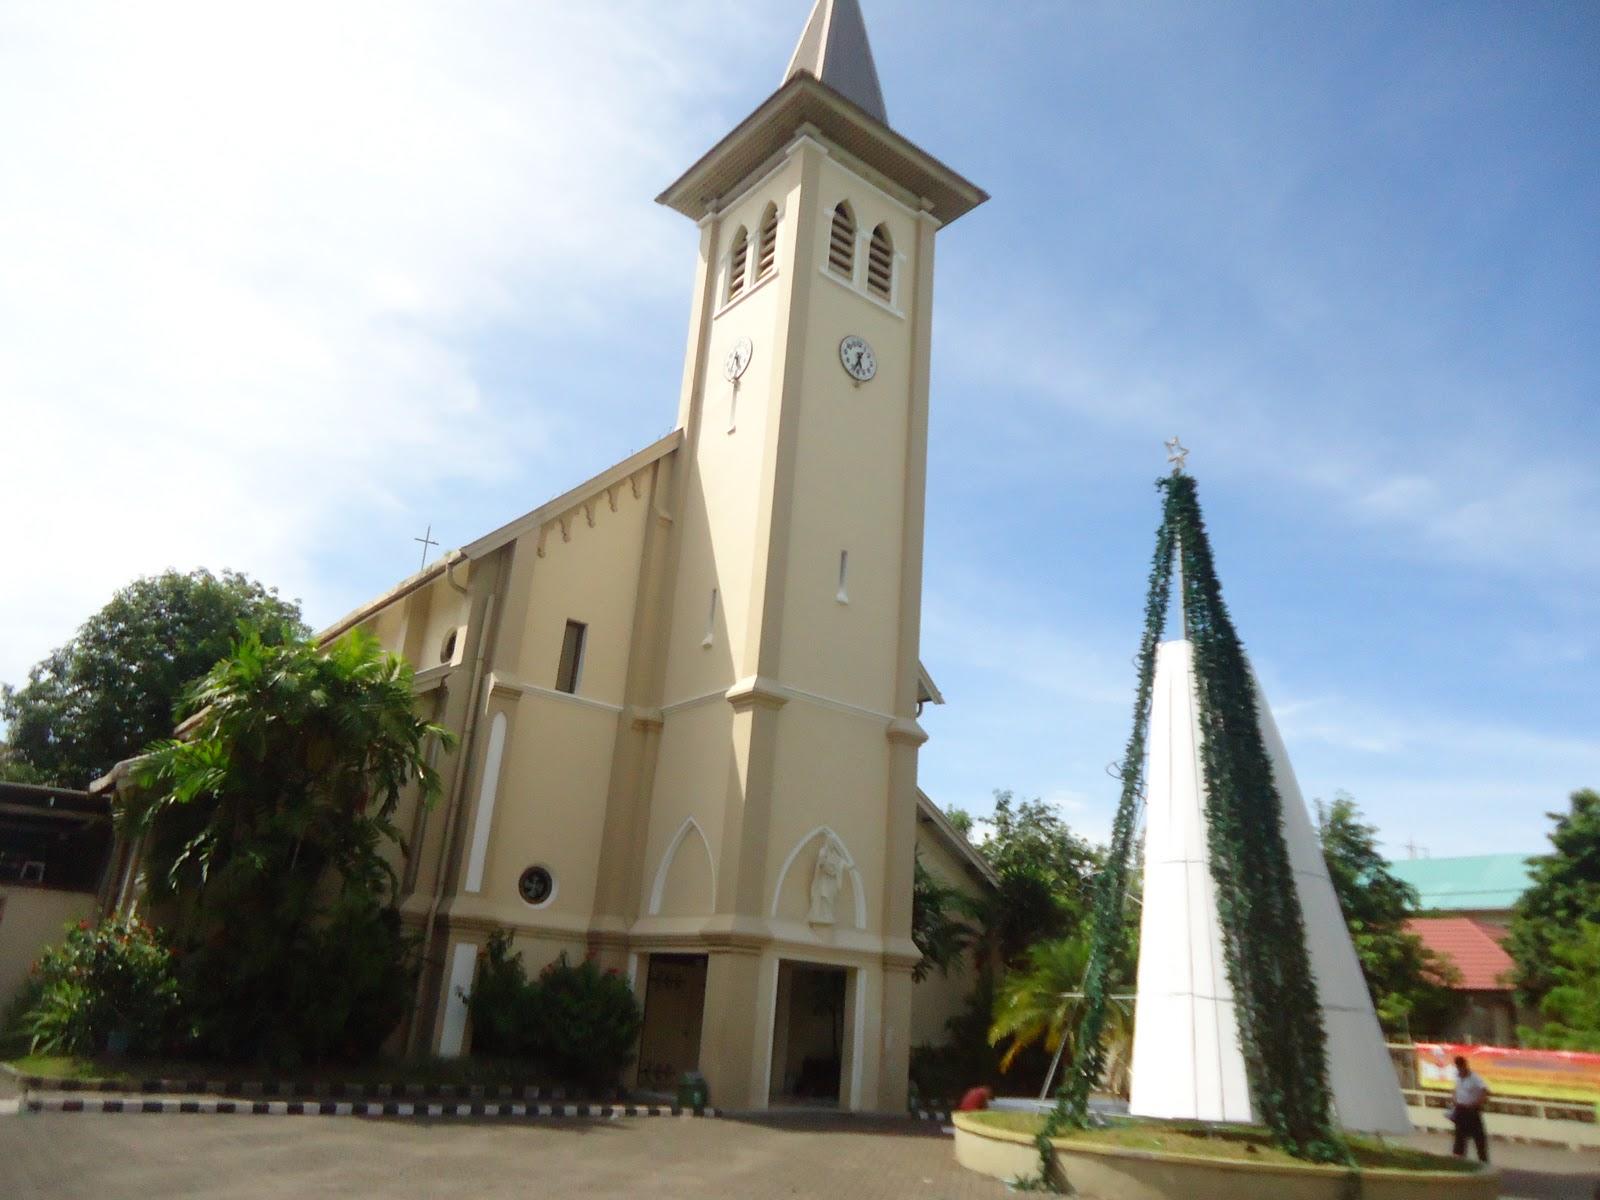 Arsitektur Bangunan Belanda Luar Makassar Gereja Katedral Ujung Pandang Kota